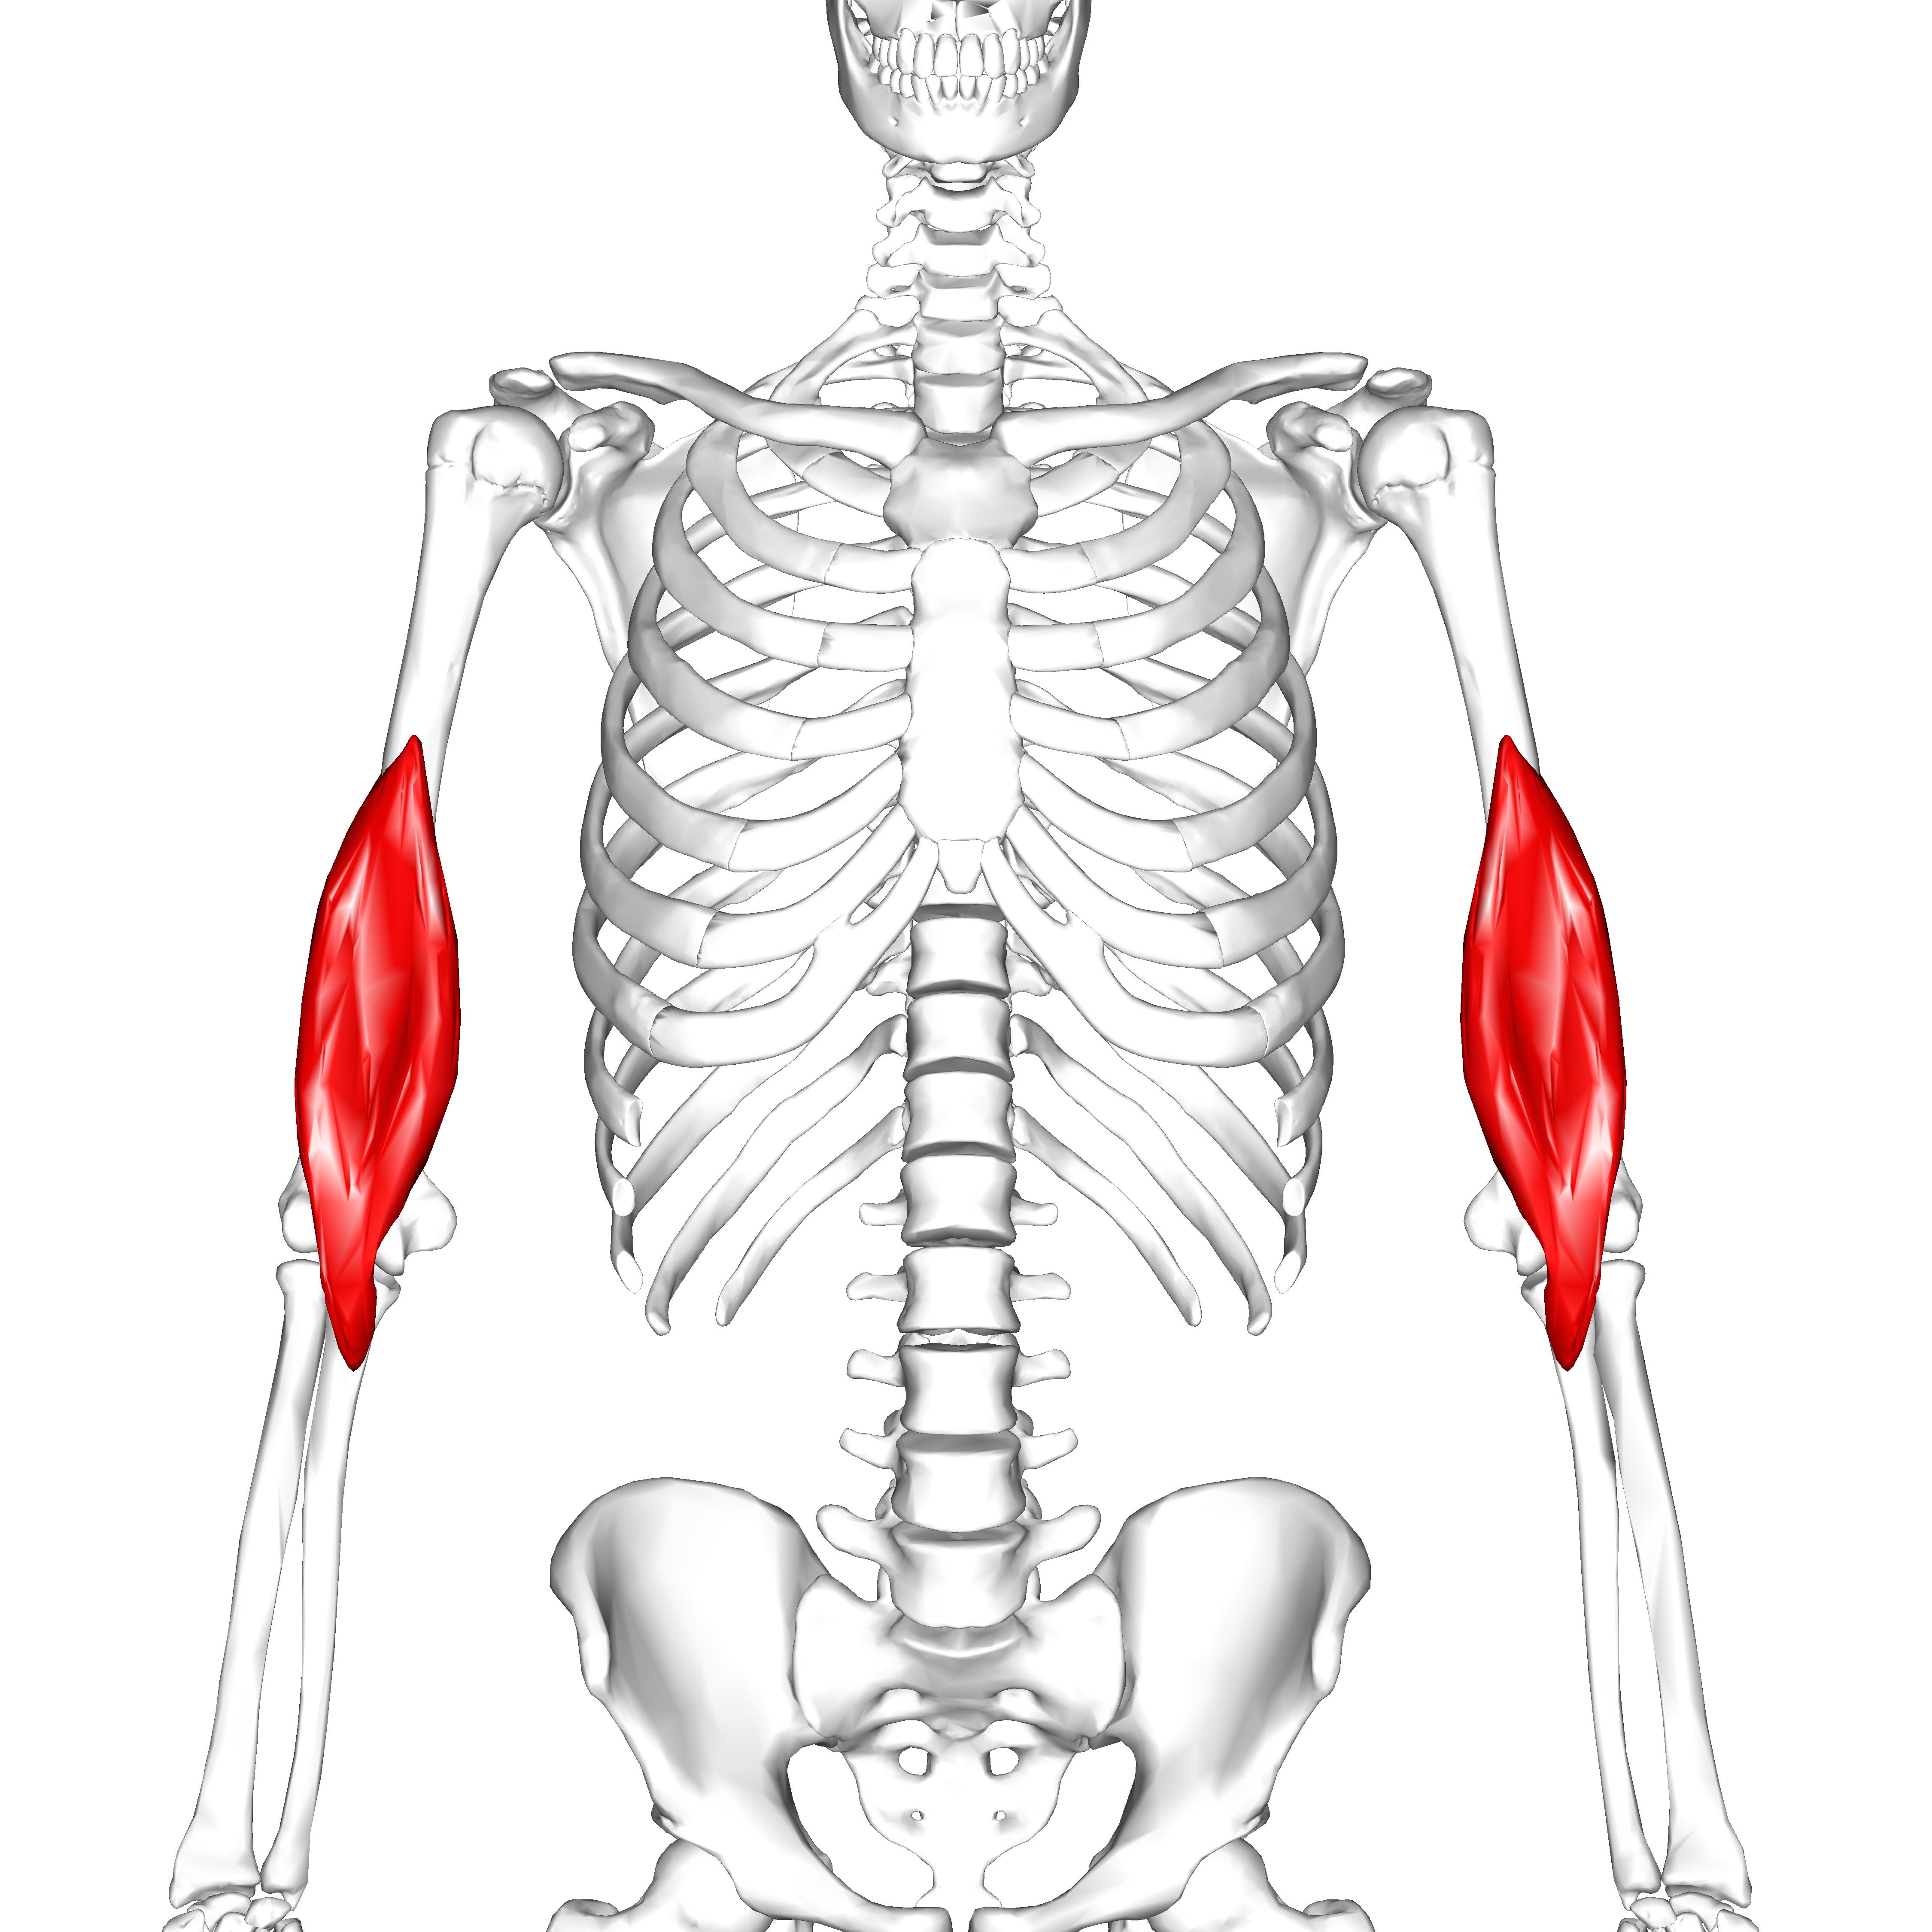 File:Brachialis muscle01.png - Wikimedia Commons